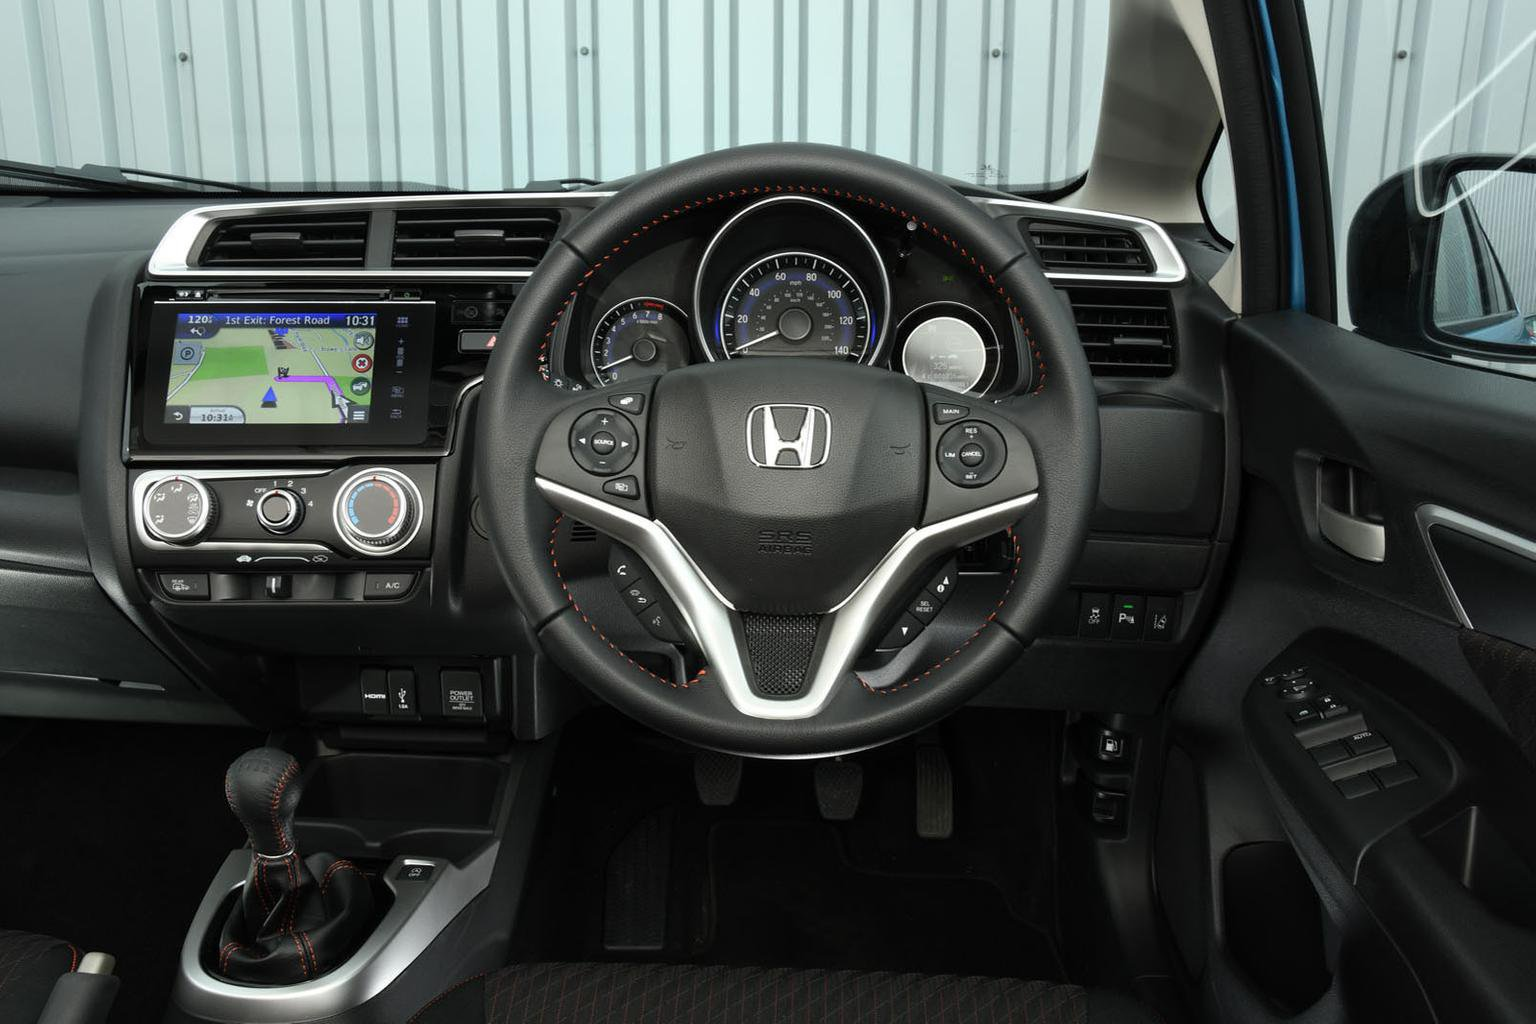 Honda Jazz 1.3 i-VTEC SE CVT auto - interior